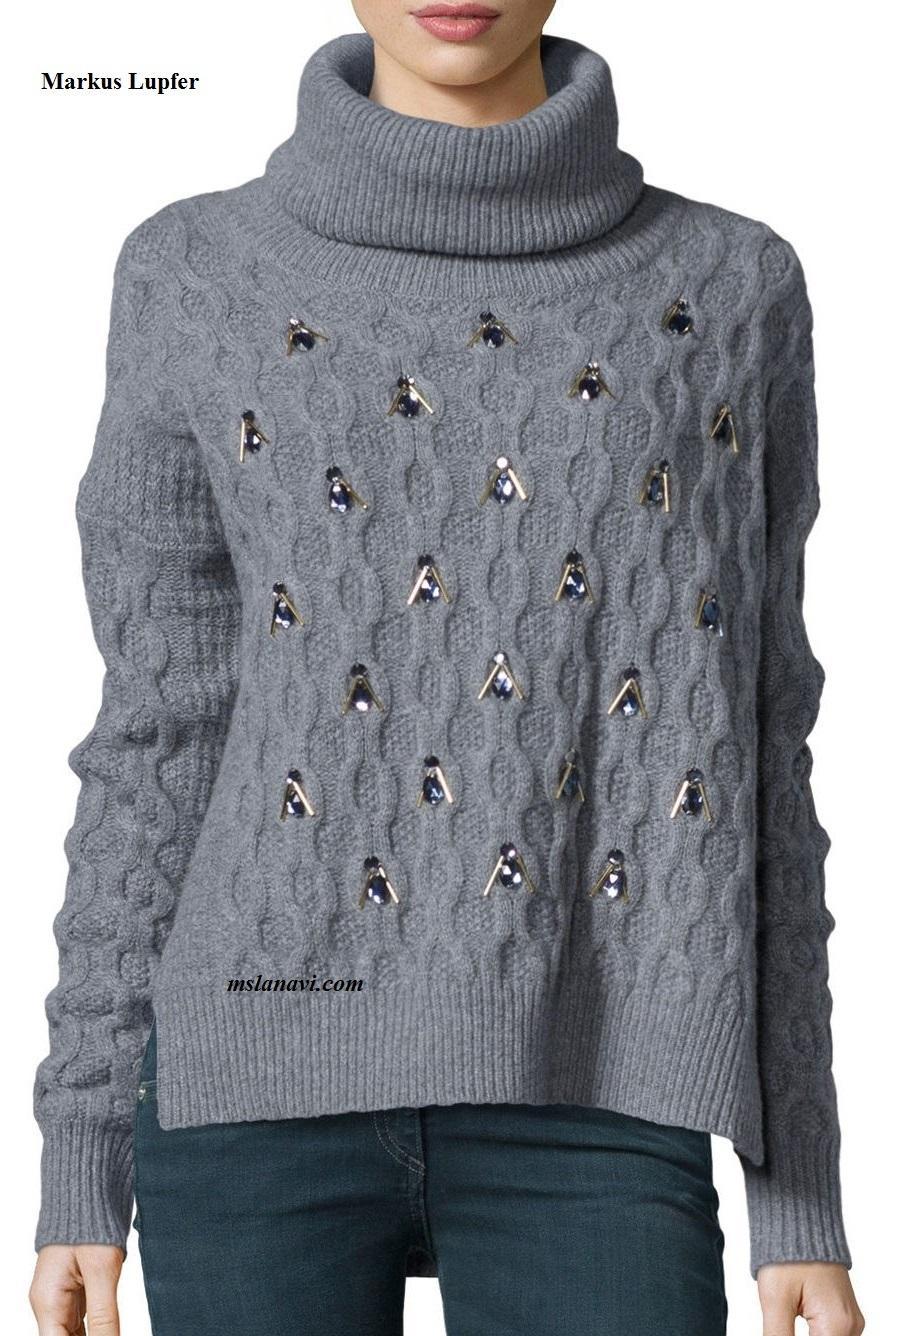 Вязаный свитер спицами от Markus Lupfer